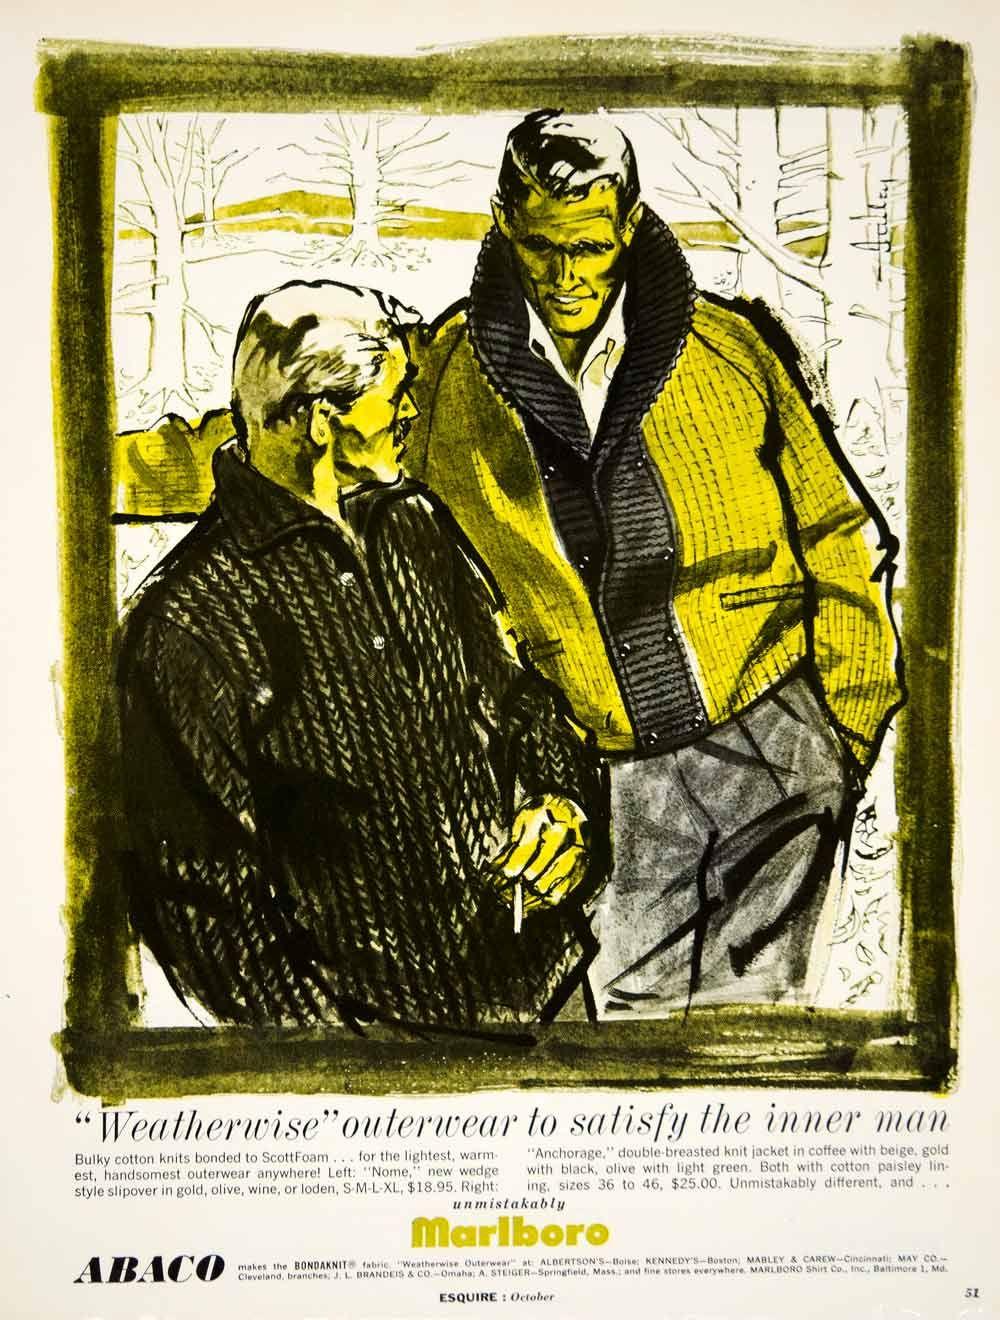 1960 Ad  Vintage Marlboro Knit Jacket Men 60s Fashion Style Outerwear Clothing